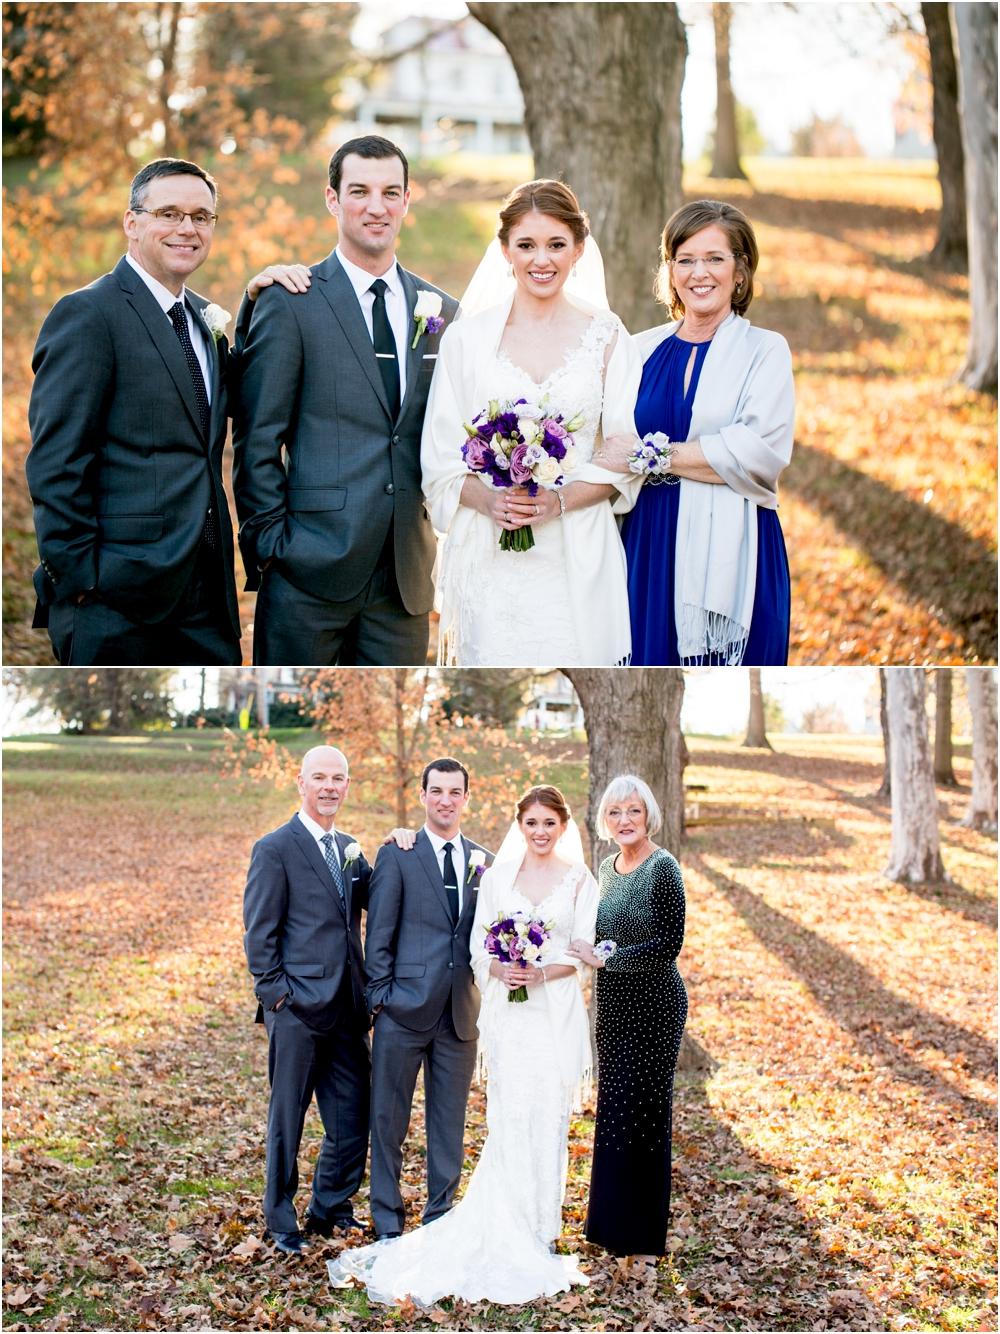 tim steph senkewicz hunt valley inn wedding living radiant photography photos_0060.jpg